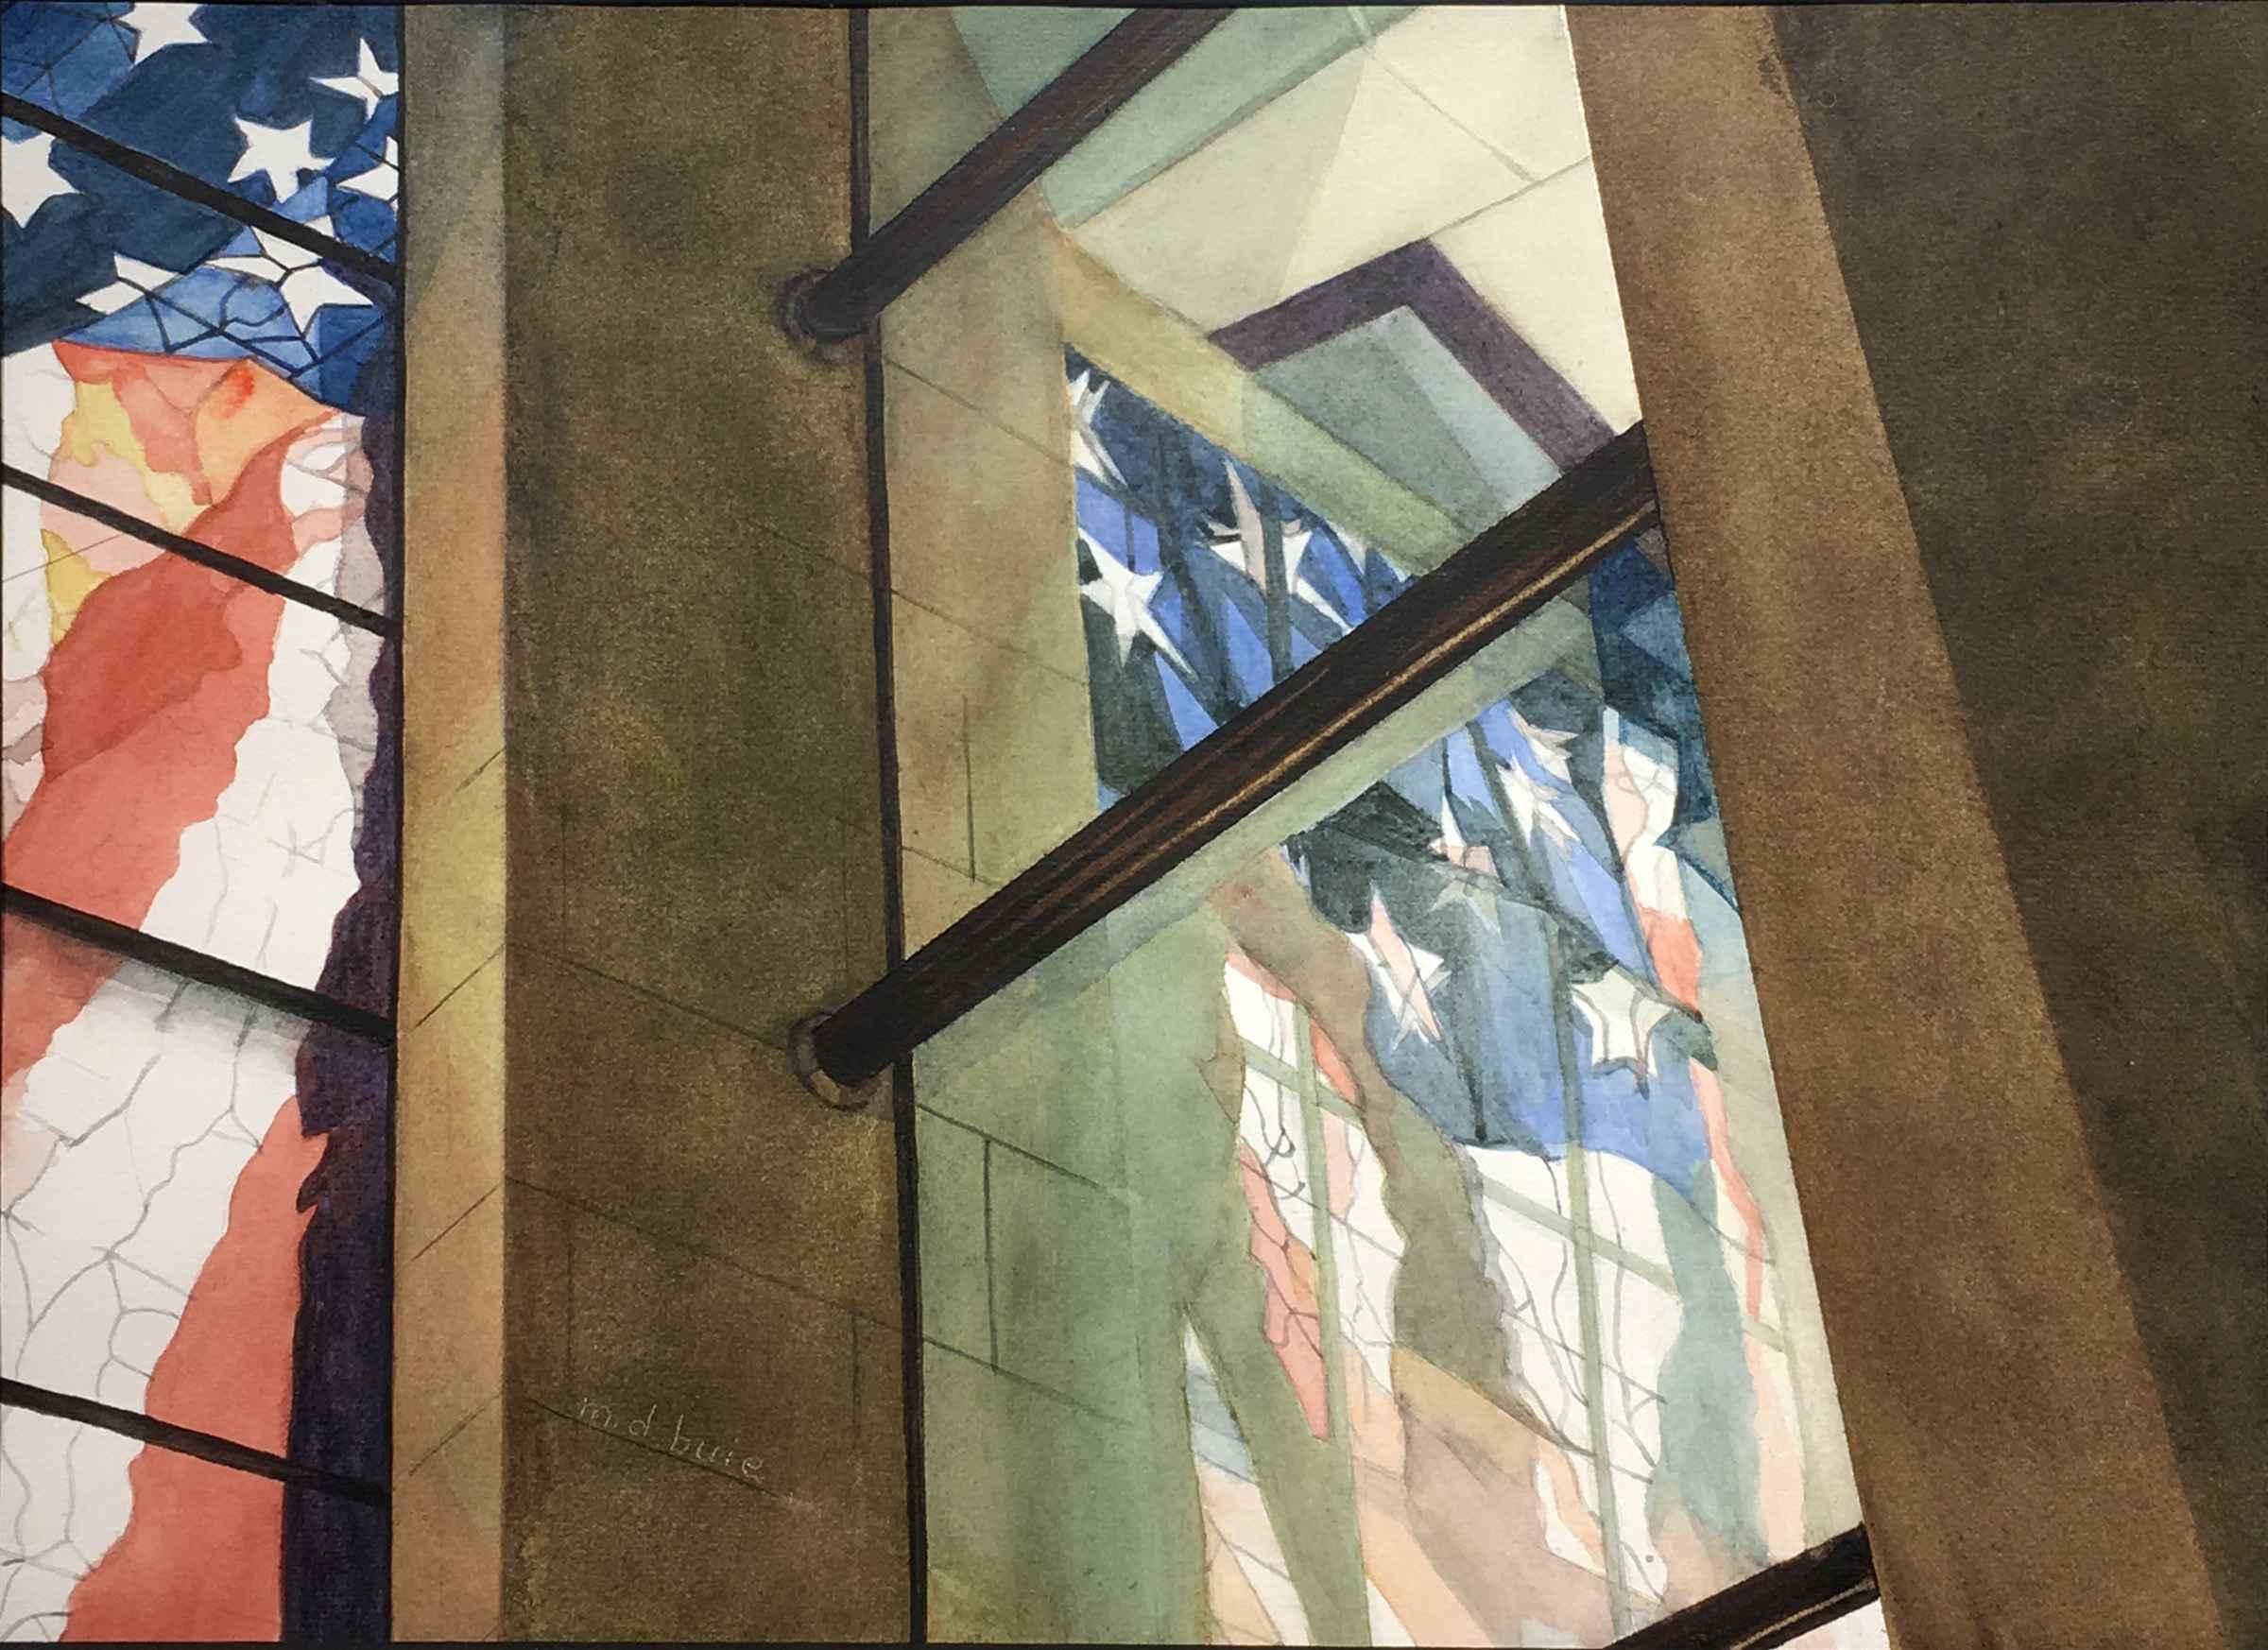 Reflections II by  Margaret Buie - Masterpiece Online